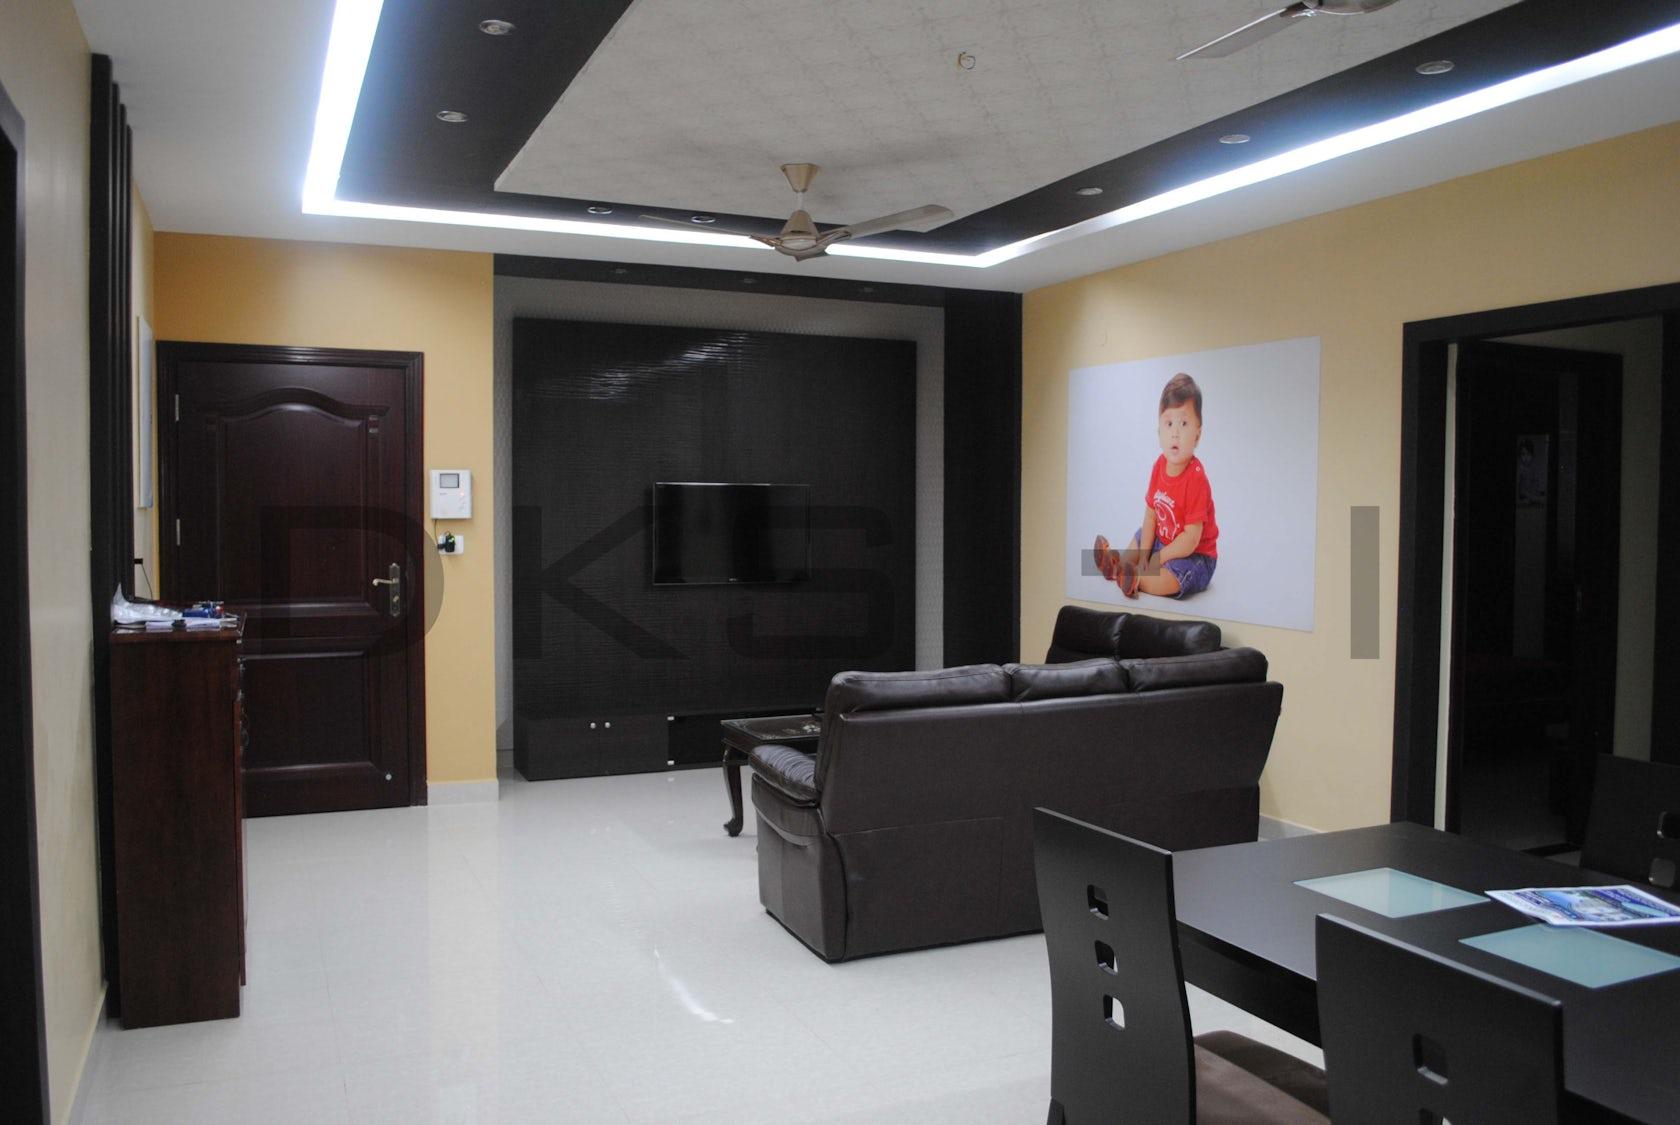 interiors residential design development for mr keerthivarman bollineni hillside architizer. Black Bedroom Furniture Sets. Home Design Ideas